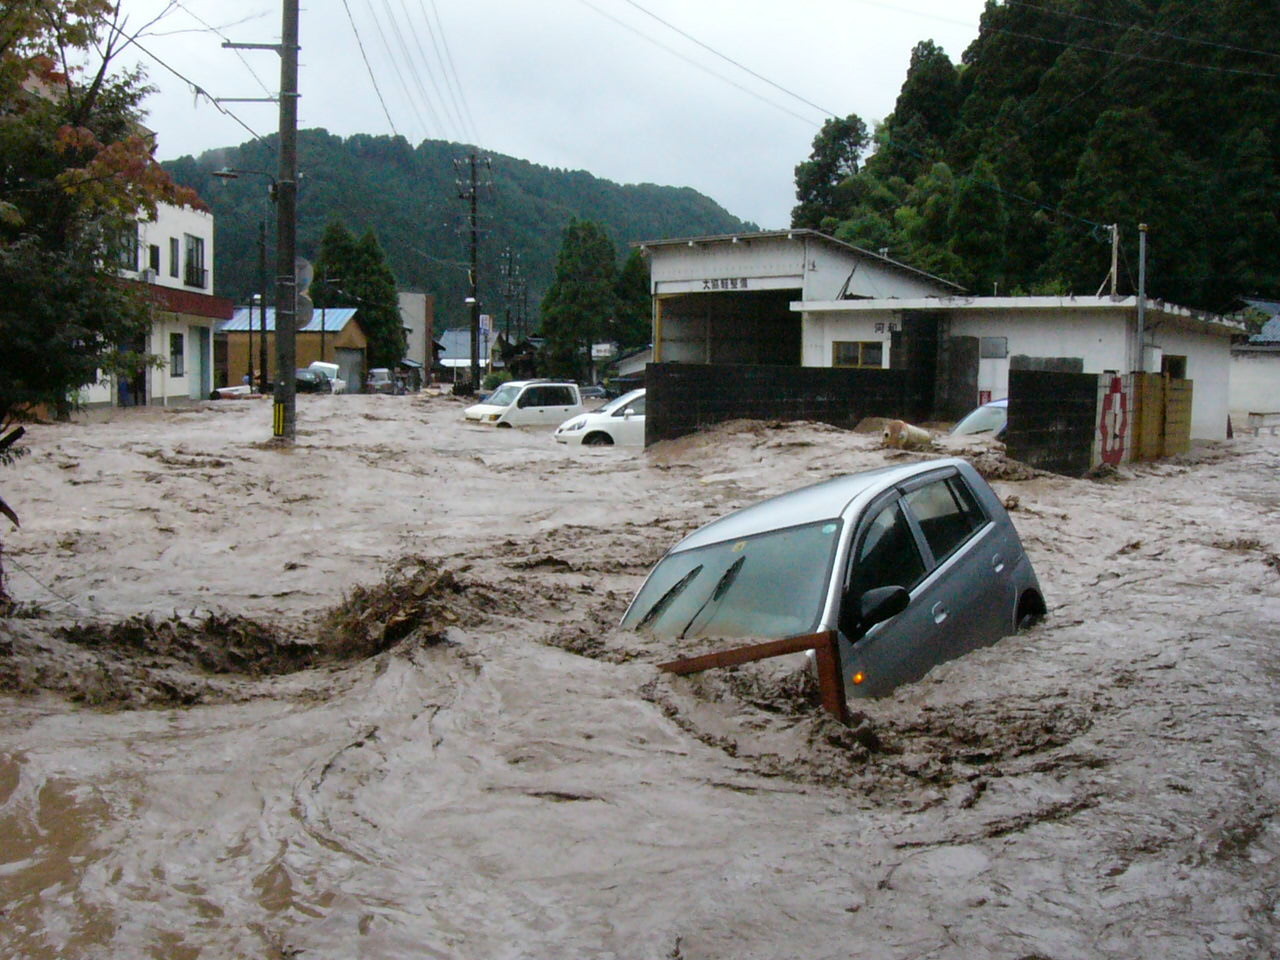 img 5a5060a7de9f1.png - 中国で大洪水!救出される豚さんの画像が可愛いとTwitterで話題